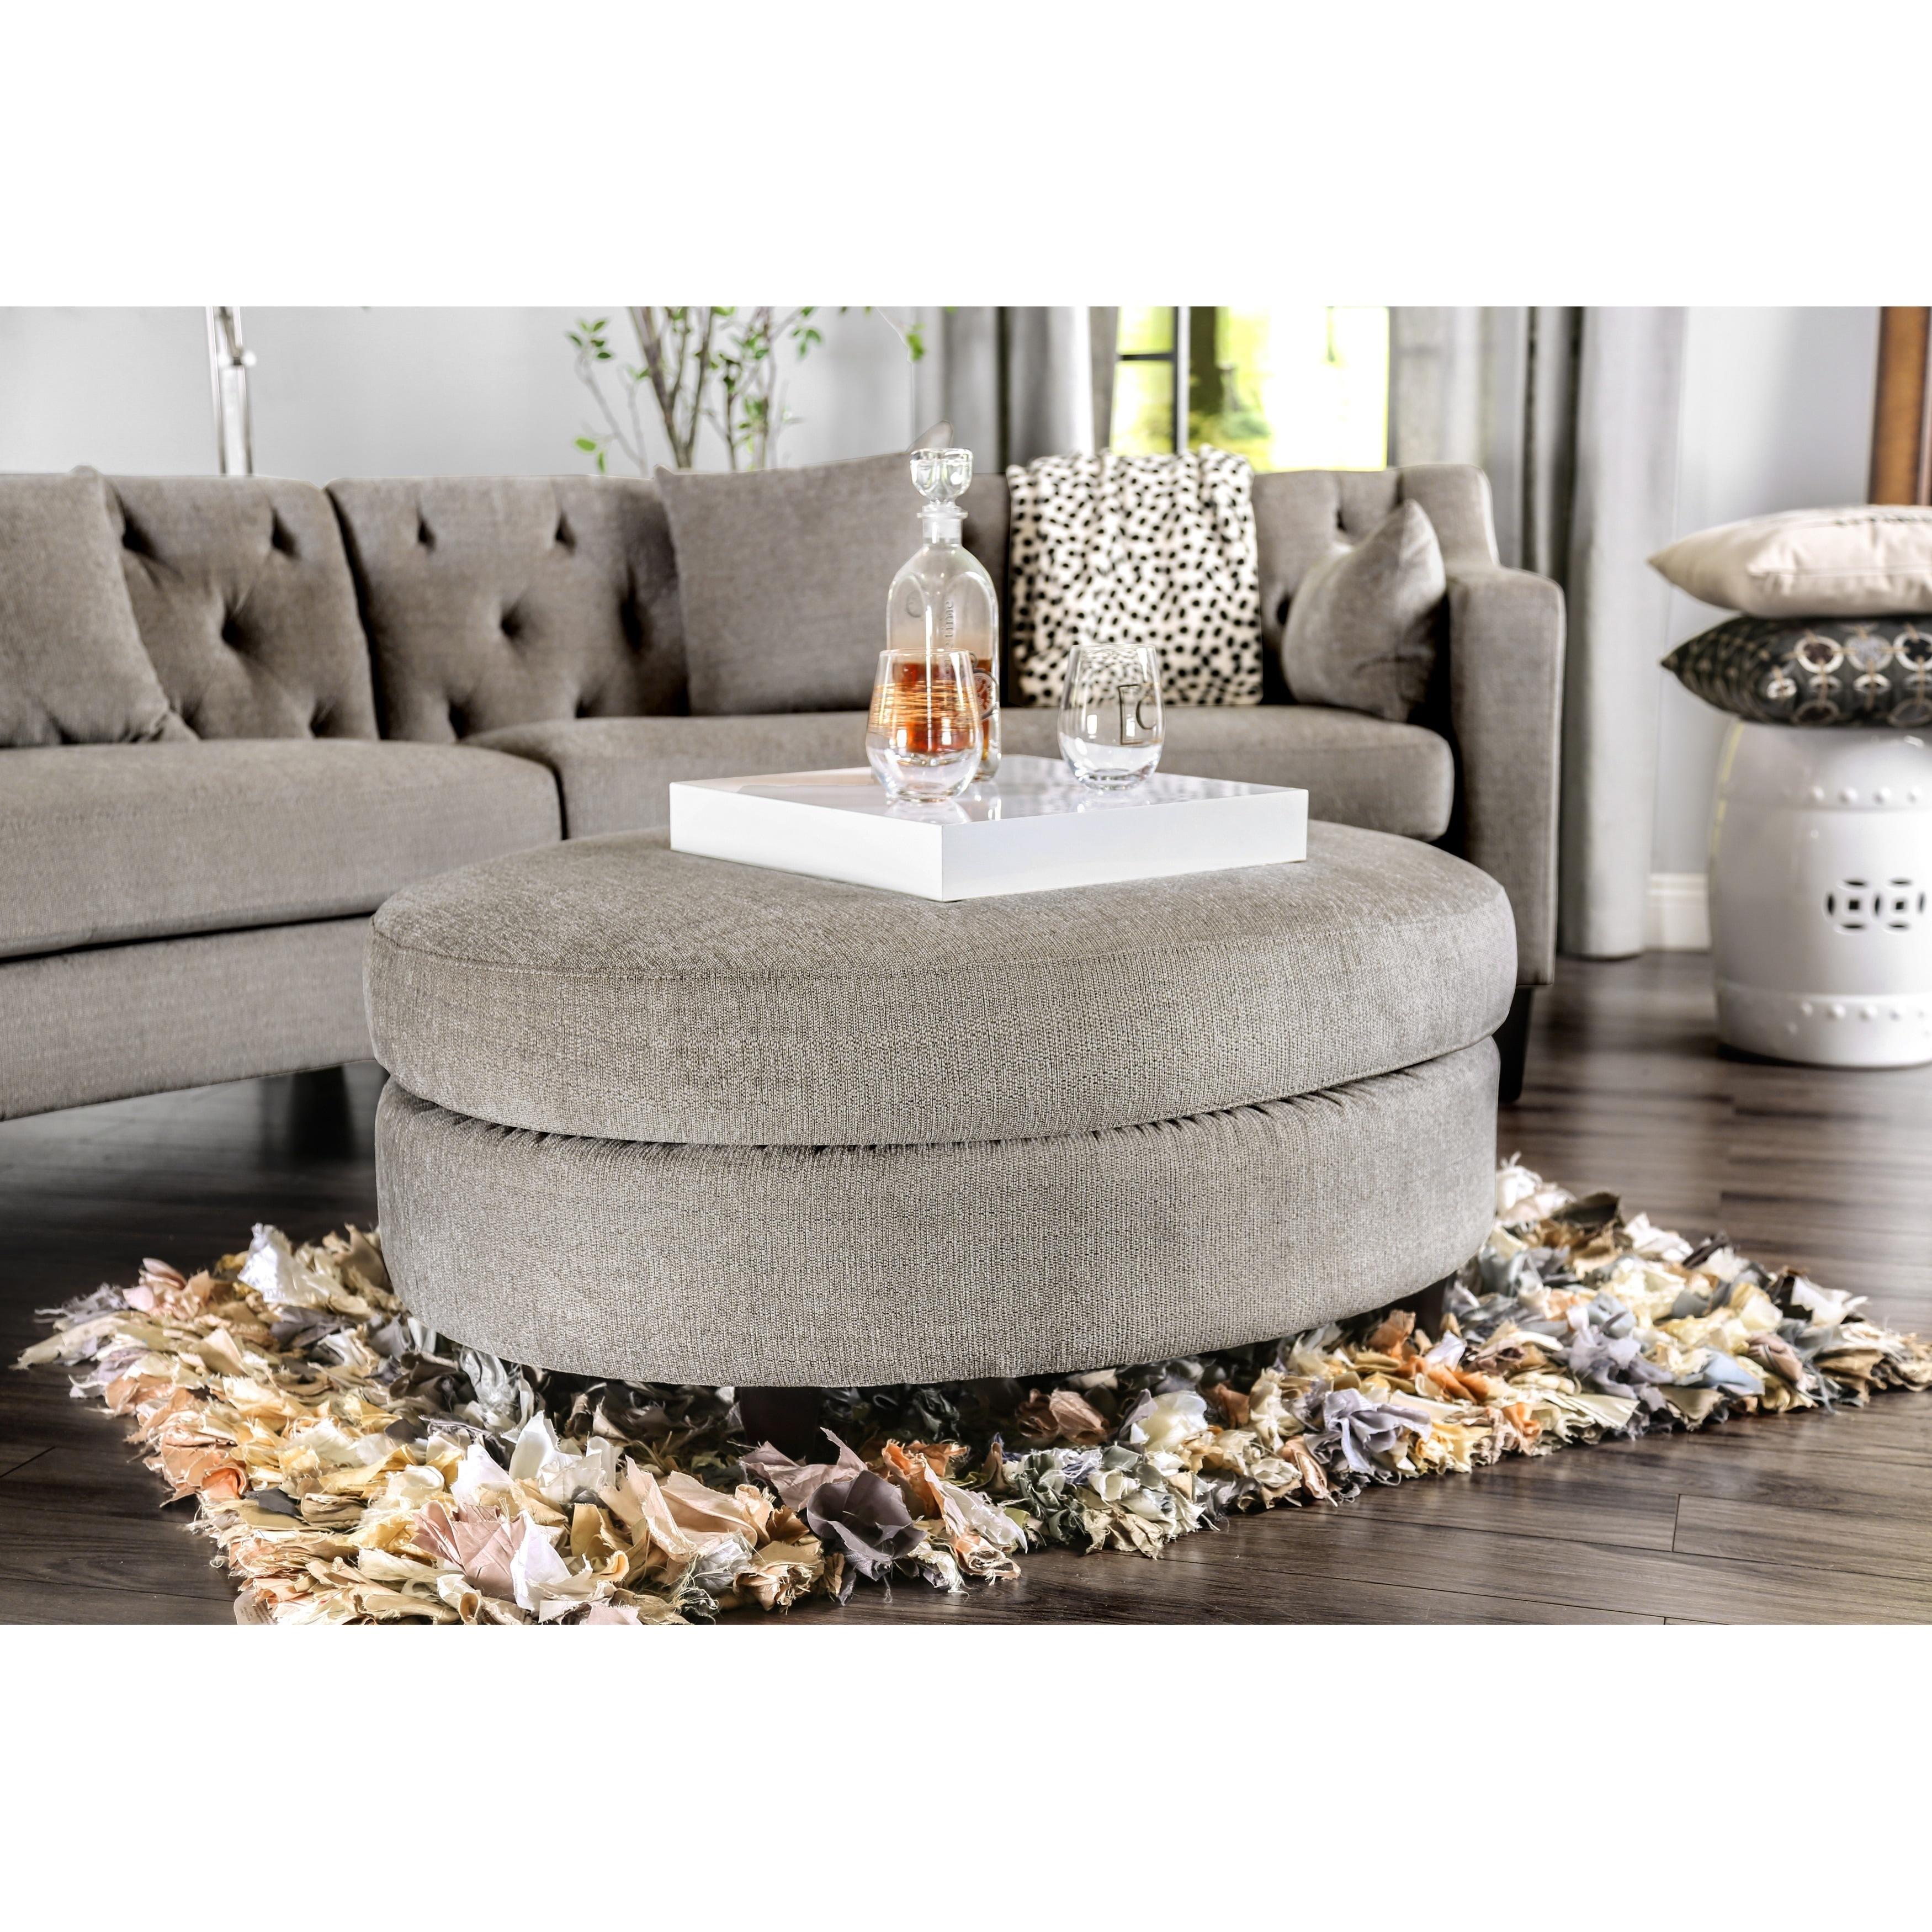 Furniture of America Aretha Contemporary Grey Oval Ottoma...